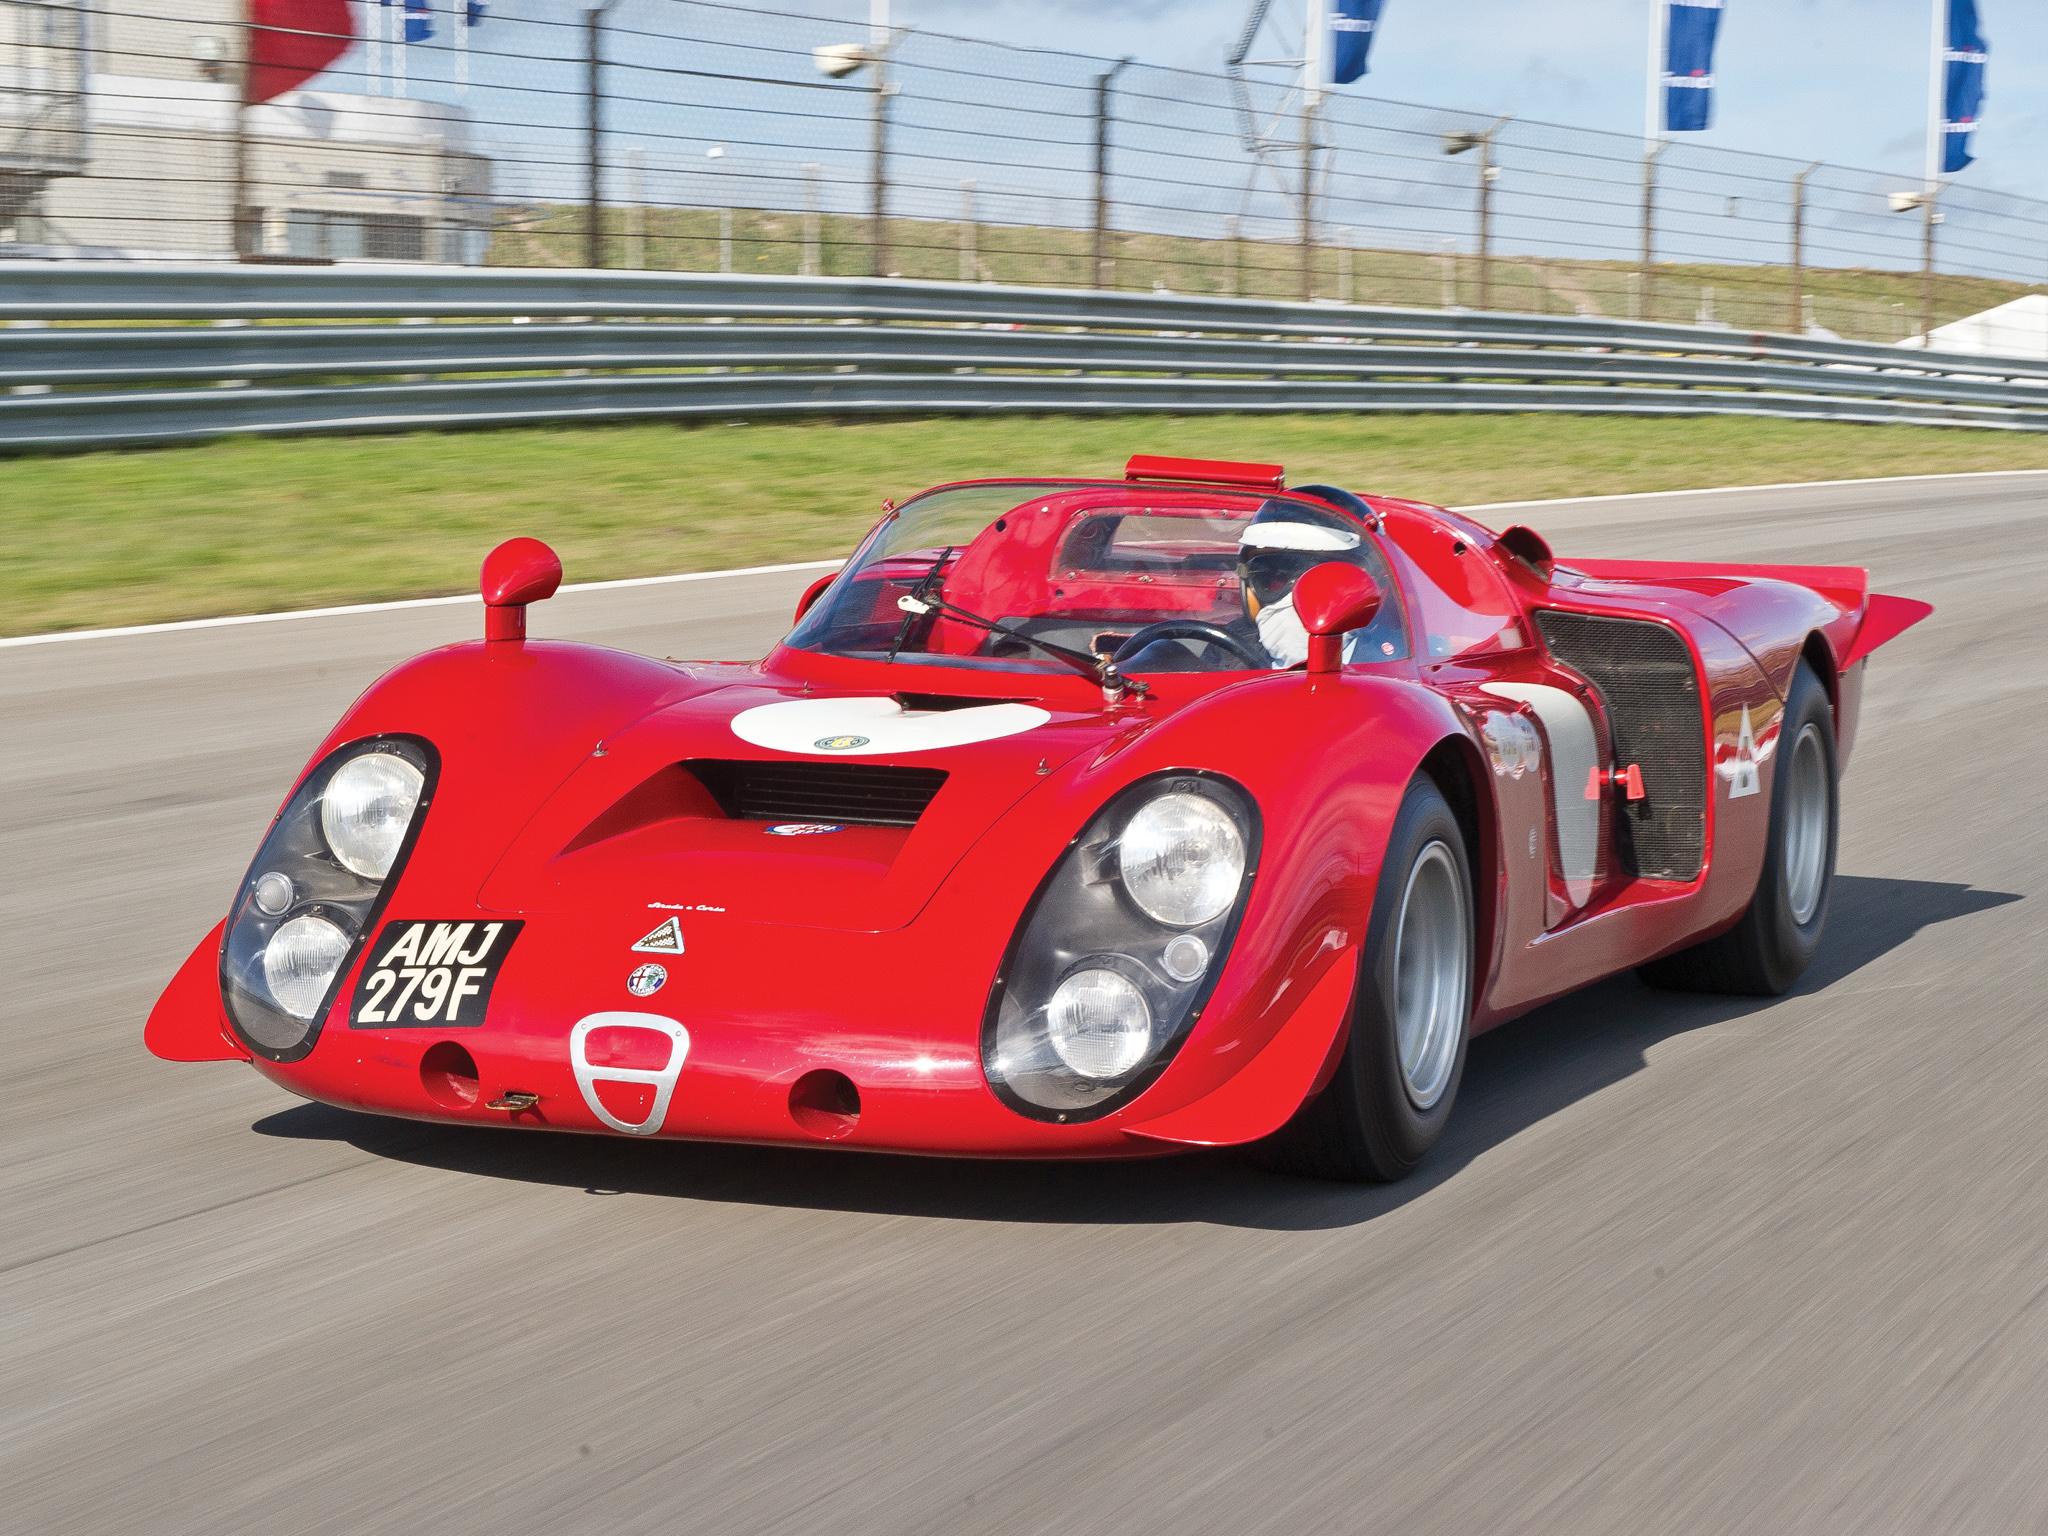 1968 alfa romeo tipo 33 2 daytona classic race racing le mans h wallpaper 2048x1536 143940. Black Bedroom Furniture Sets. Home Design Ideas